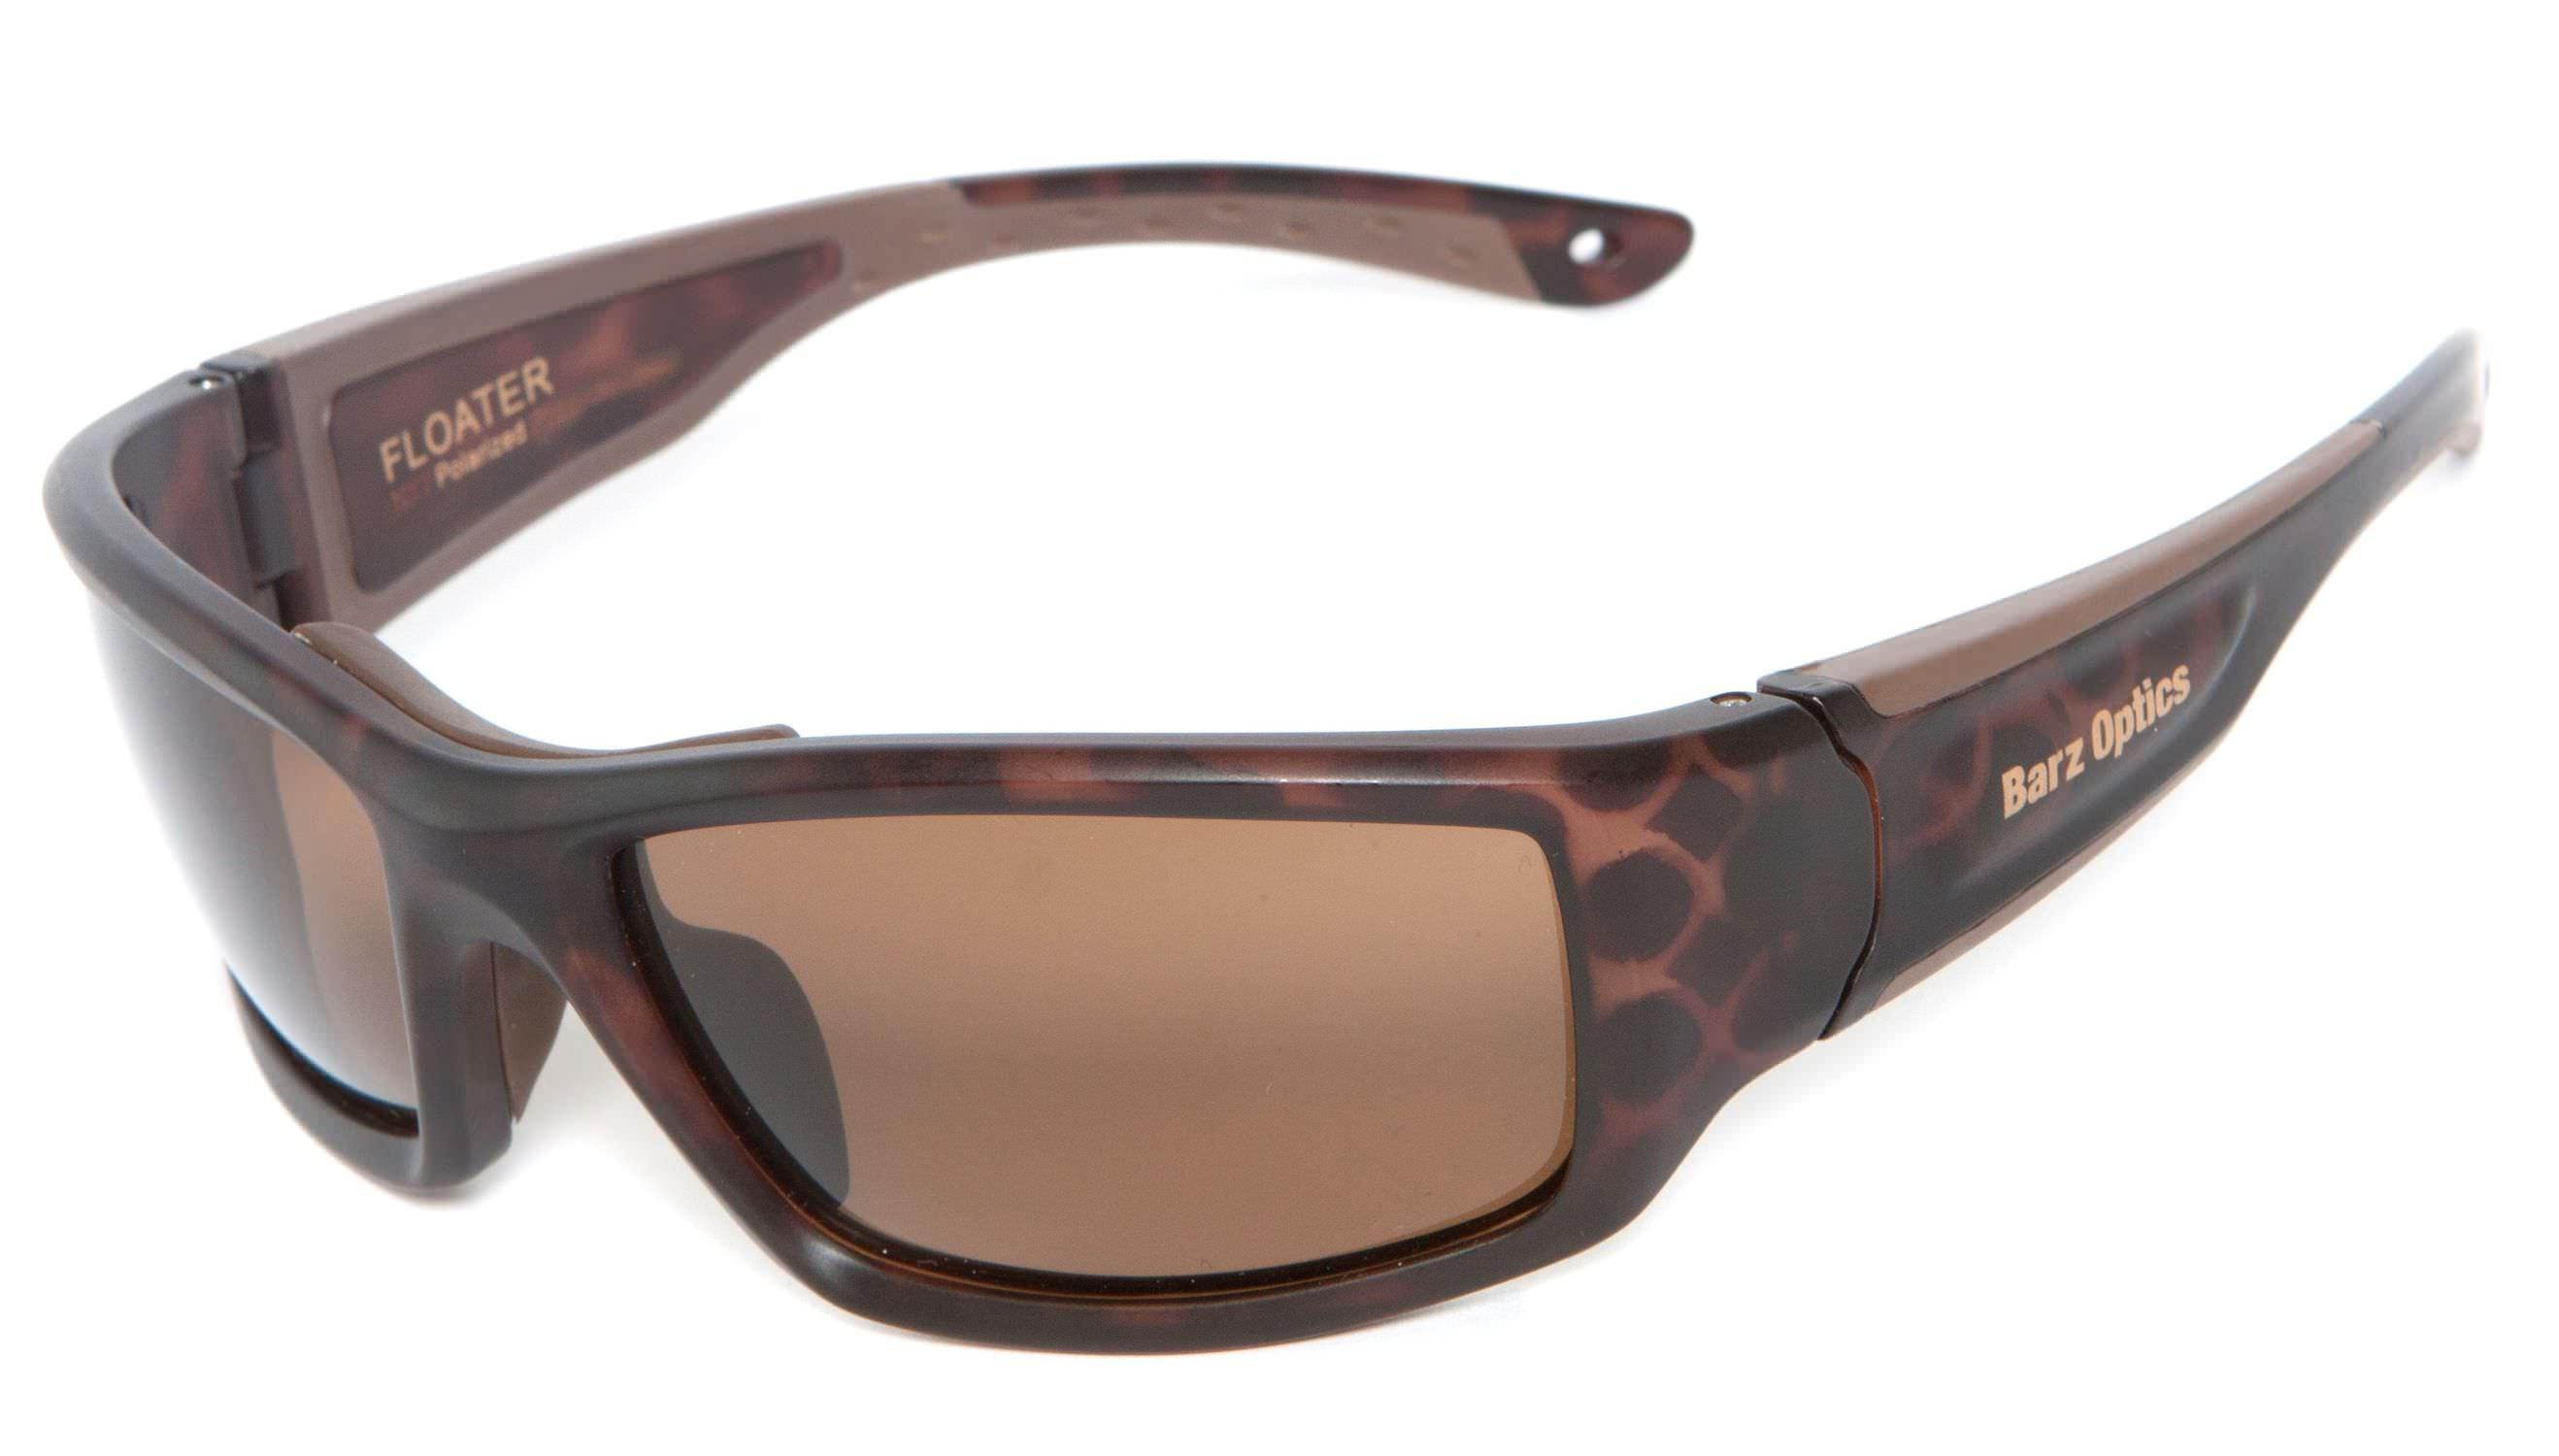 59a718e3d9c69 Floating sunglasses   watersports - FLOATER - Barz Optics